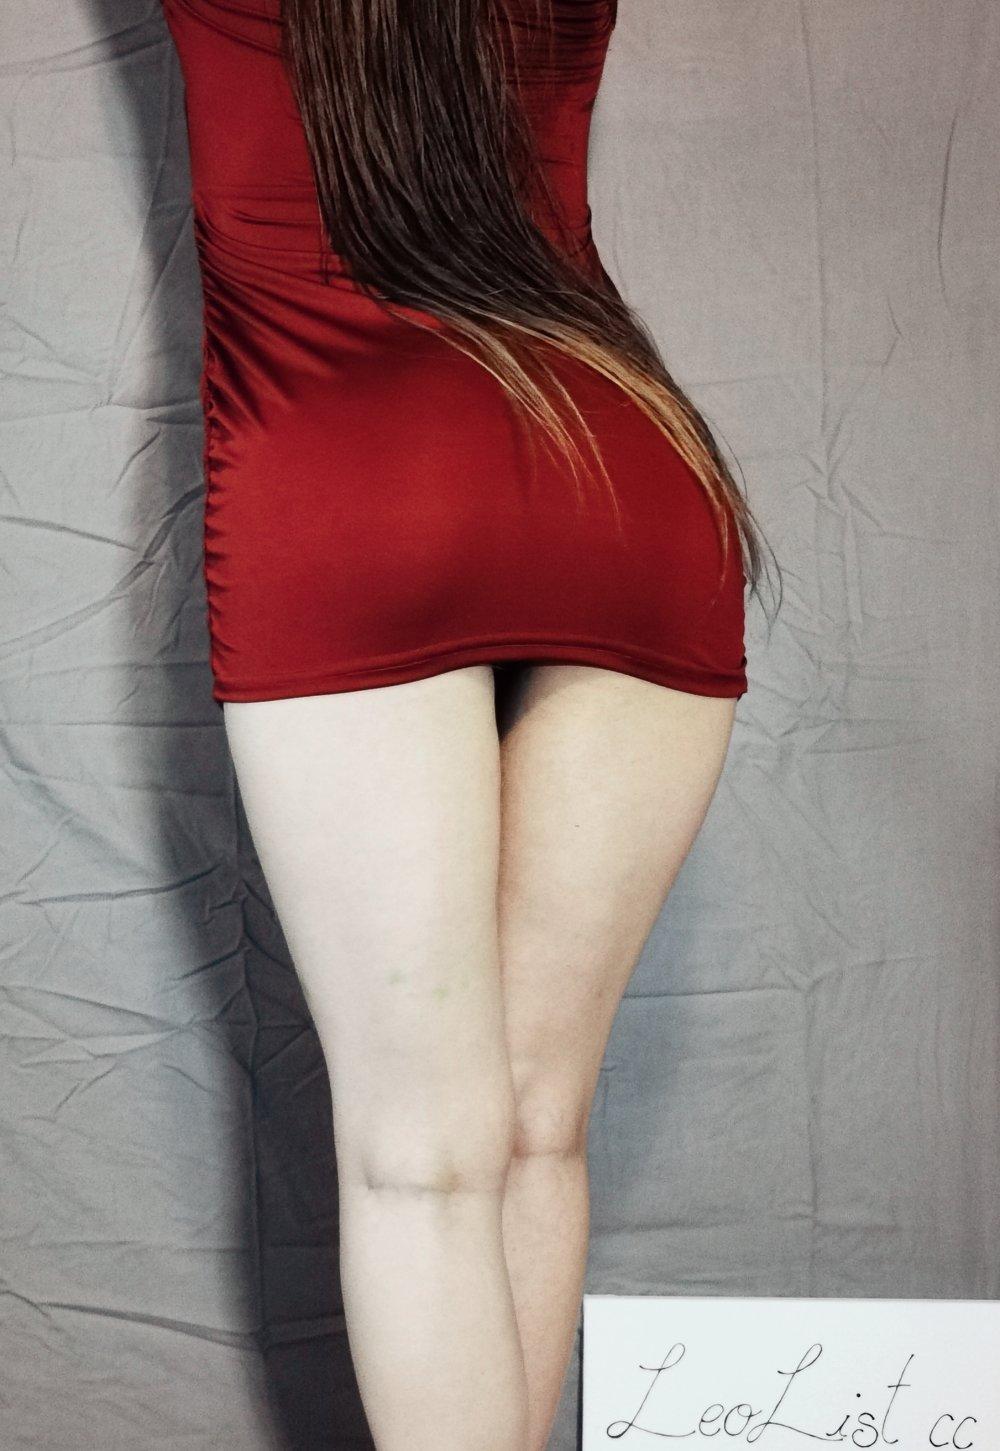 Mary69Jane420 at StripChat